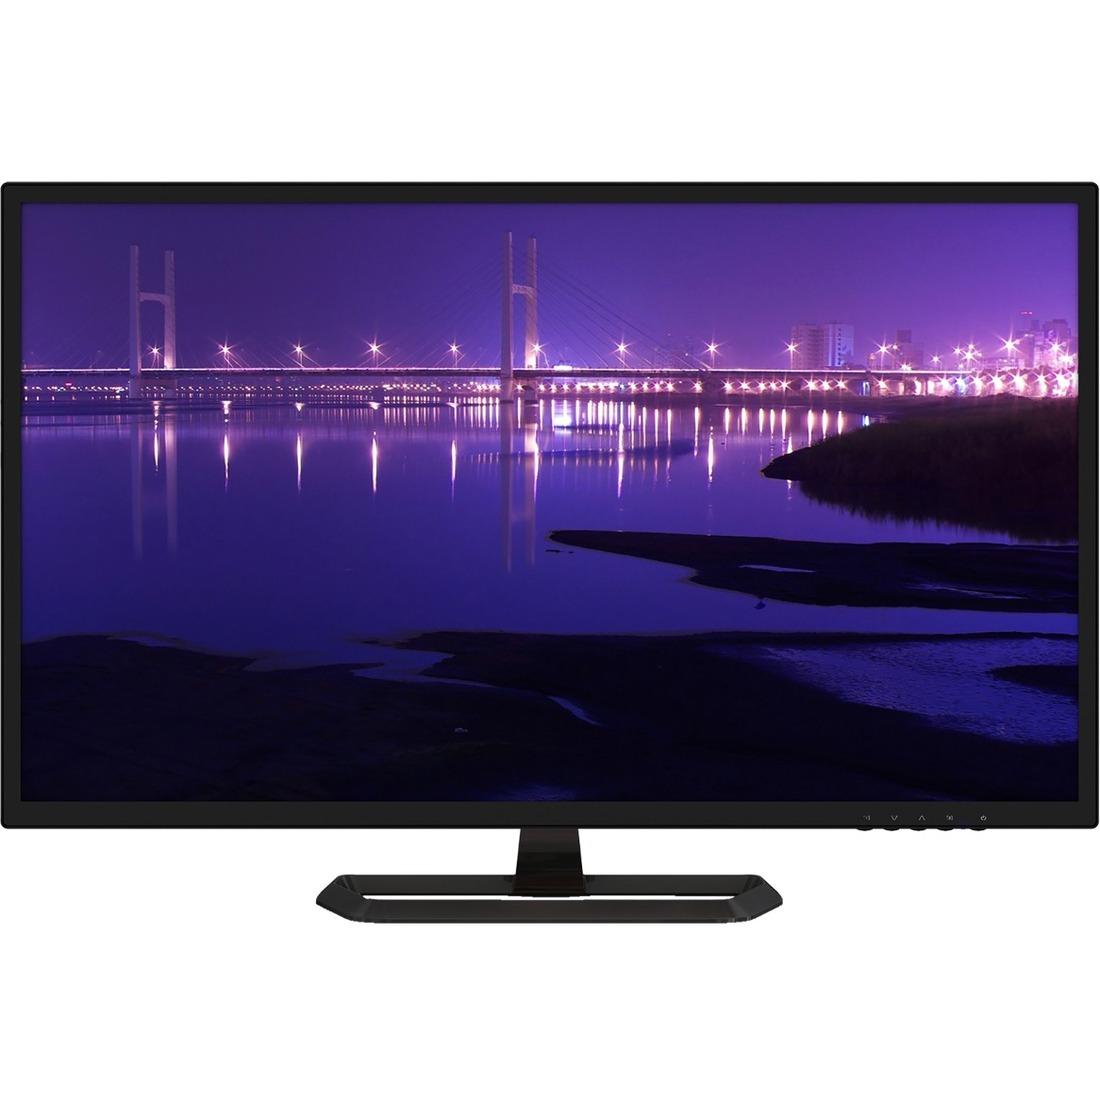 "Planar PXL3280W 31.5"" WQHD LED LCD Monitor - 16:9_subImage_1"